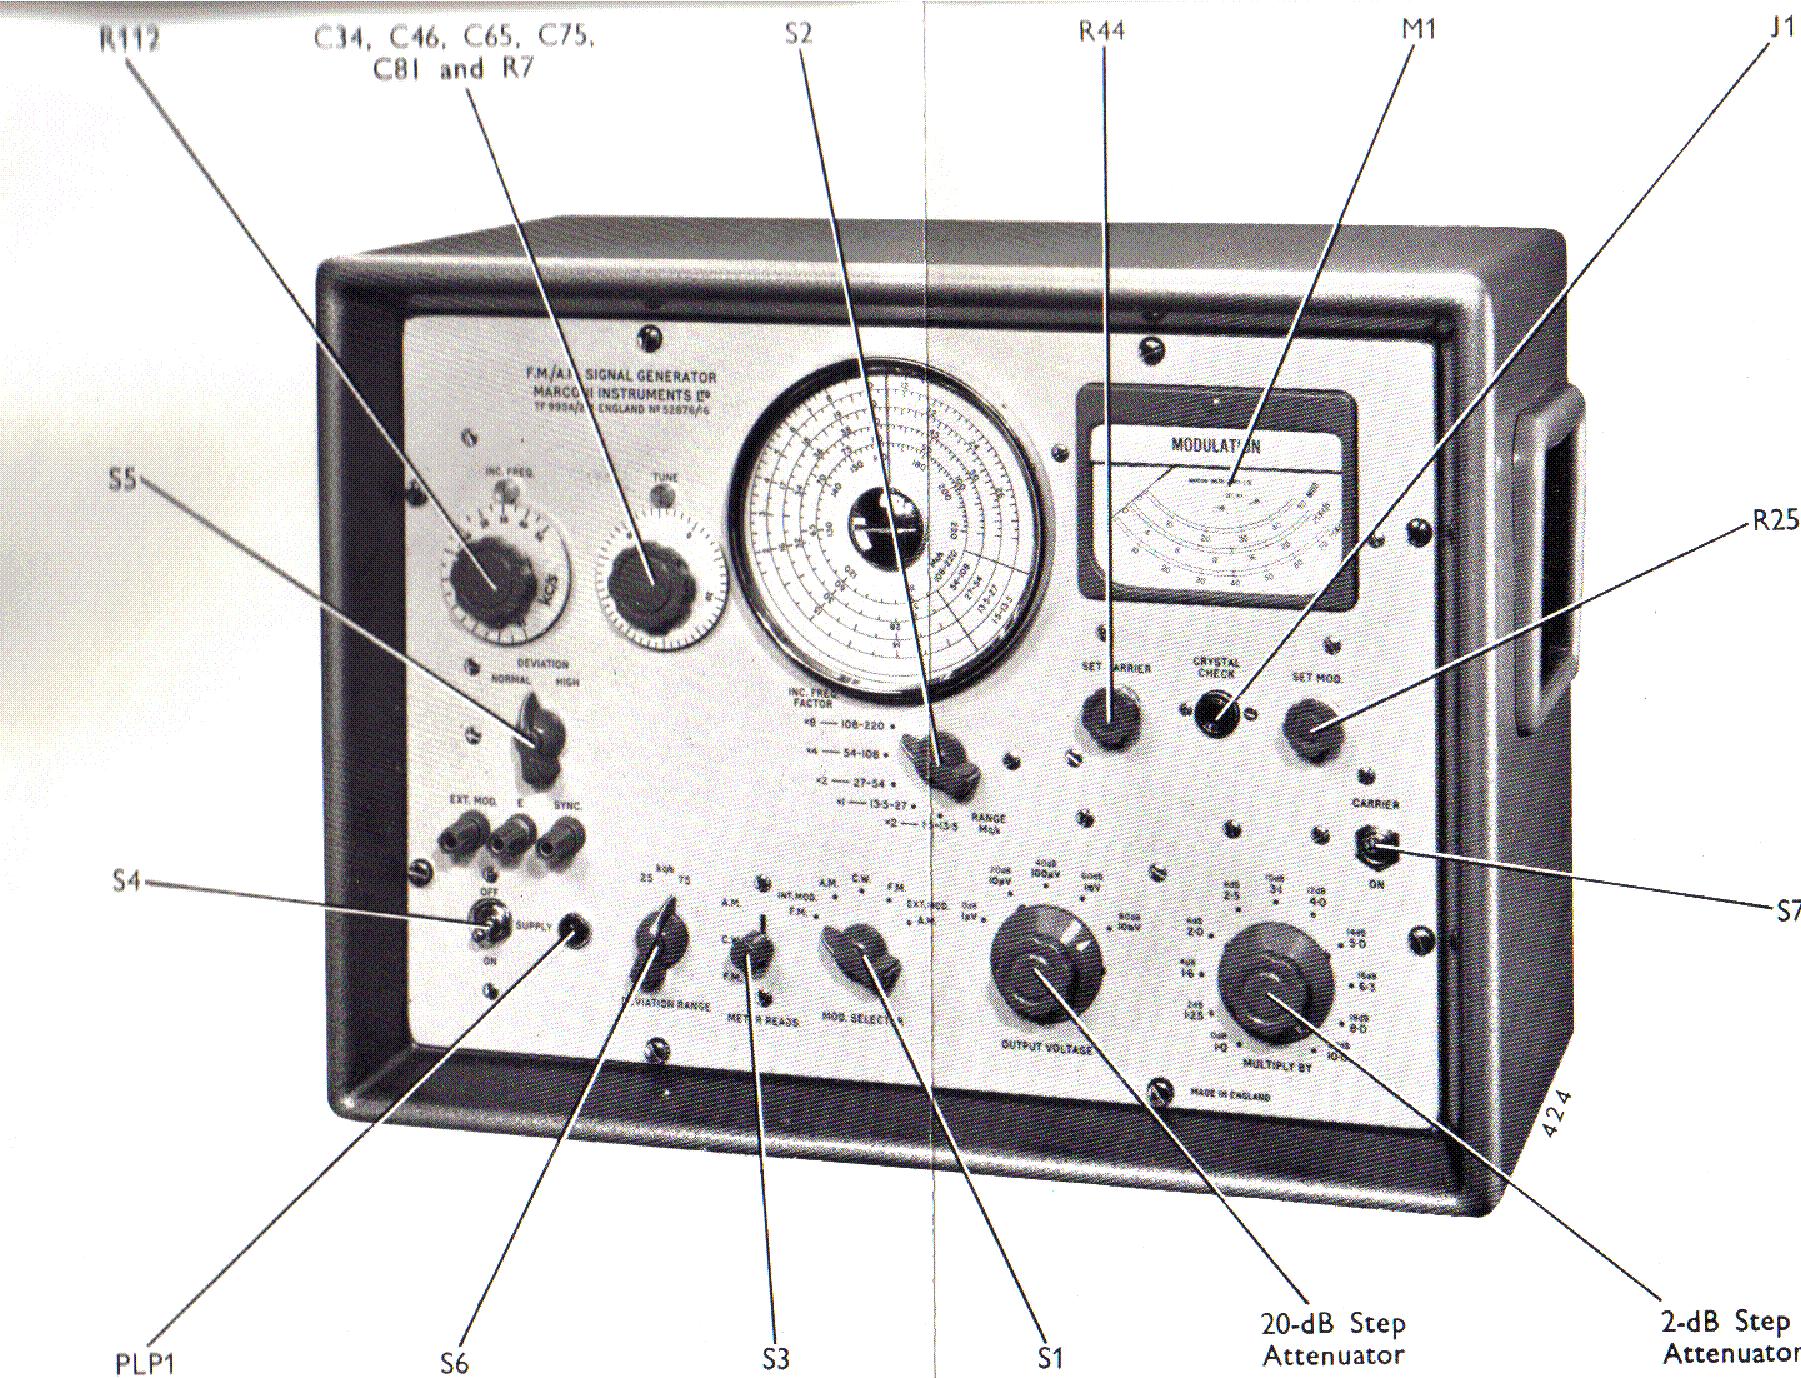 MARCONI TF995 1-220MHZ AM-FM SIGNALGENERATOR SCH Service